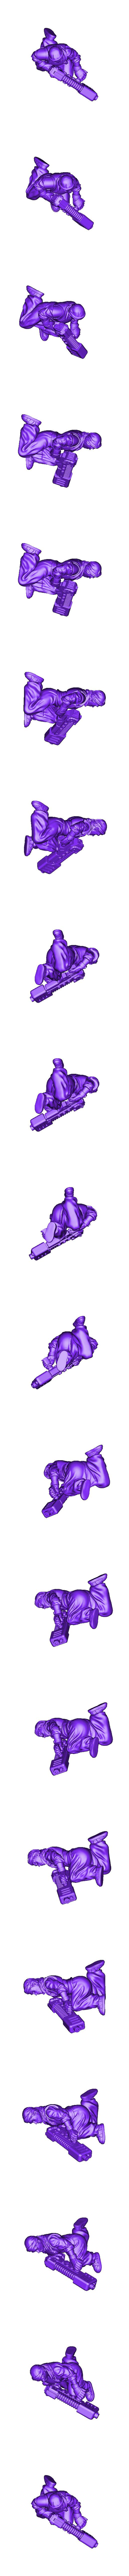 Plasma Cooker Trooper 001.stl Download free STL file Female Guard - Guardswoman - Azadi Death Front Plasma Trooper • 3D printing template, 40Emperor